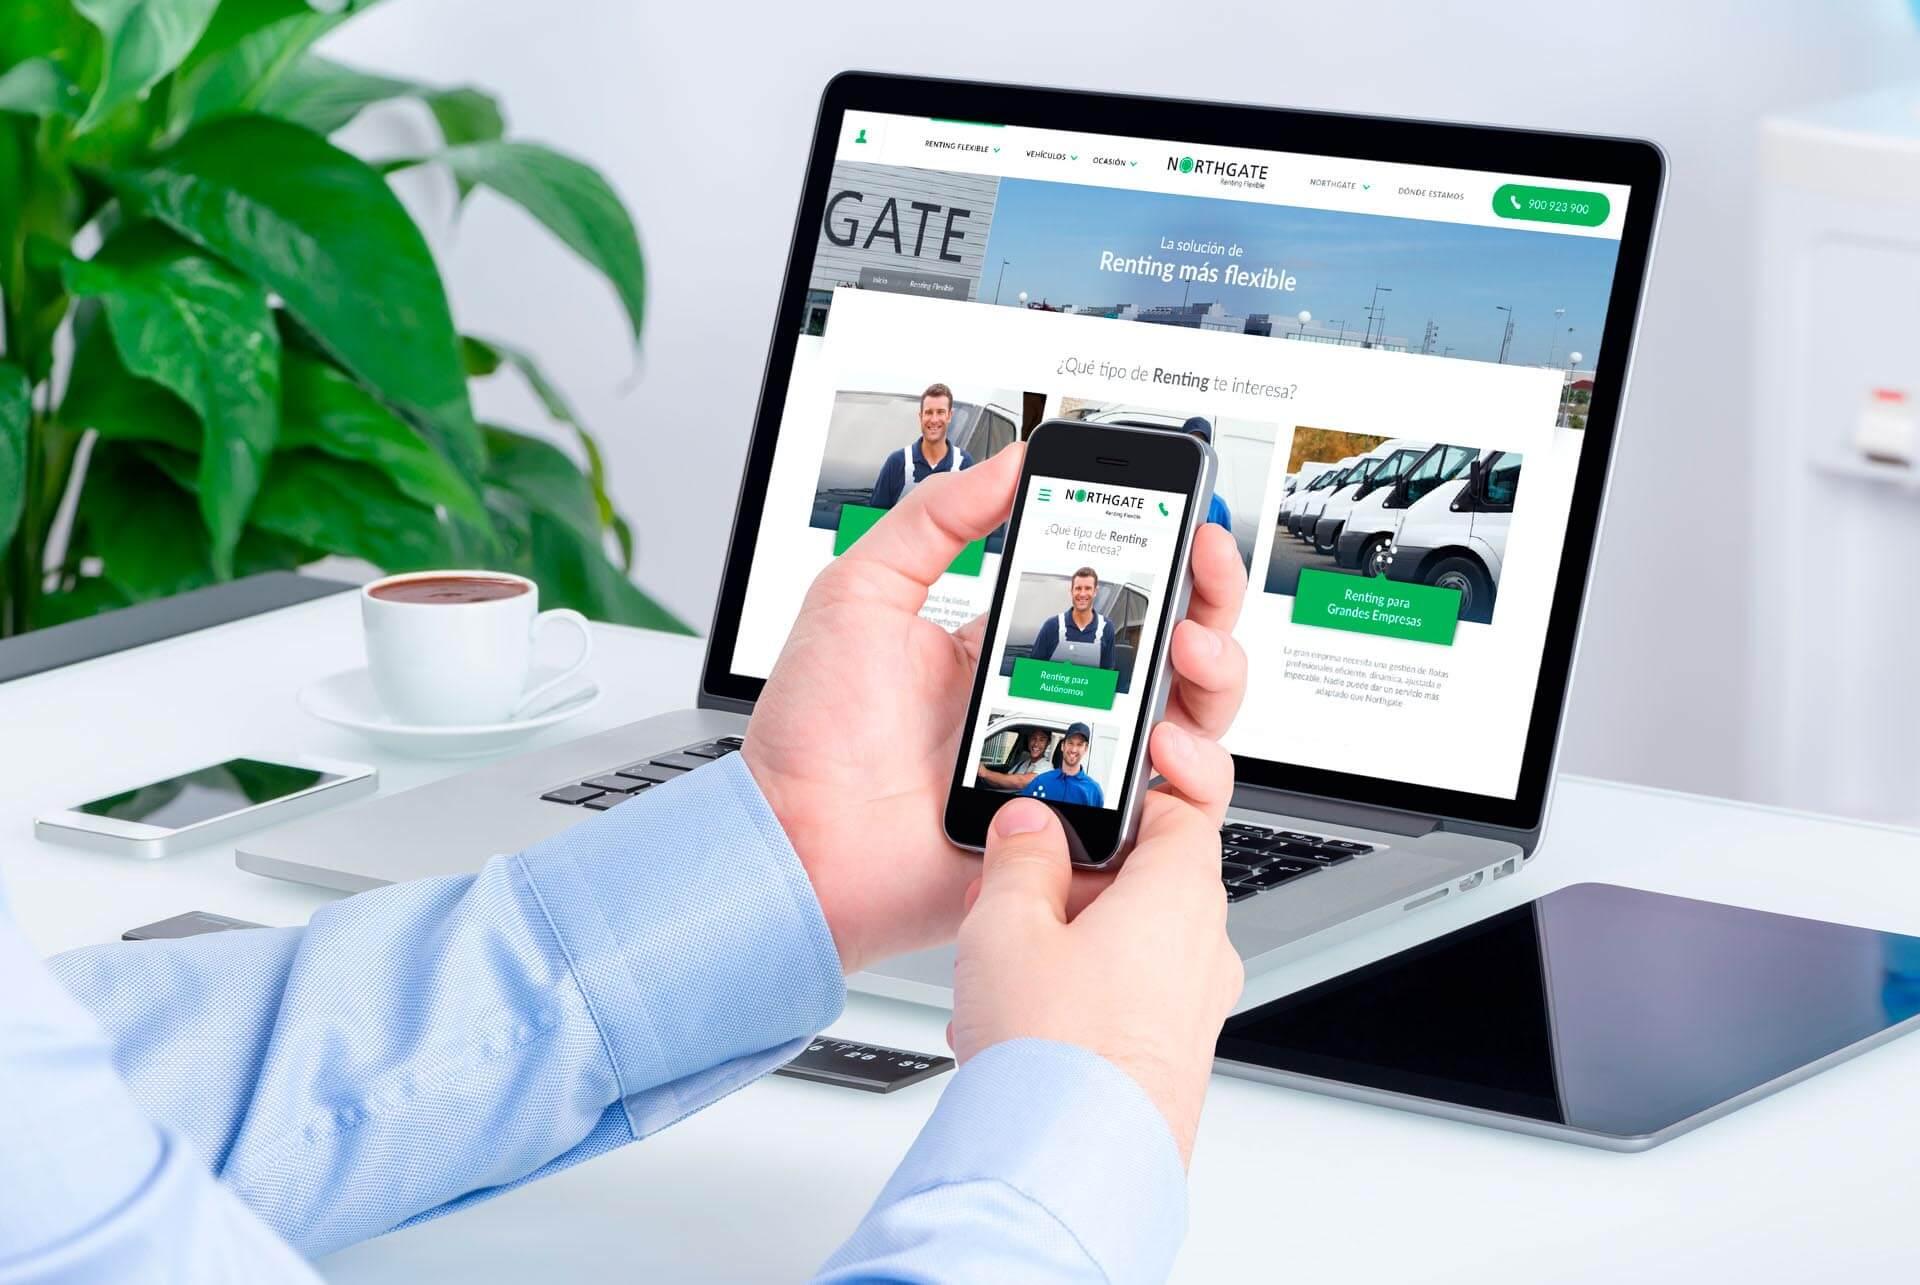 Renting Flexible. Northgate desktop